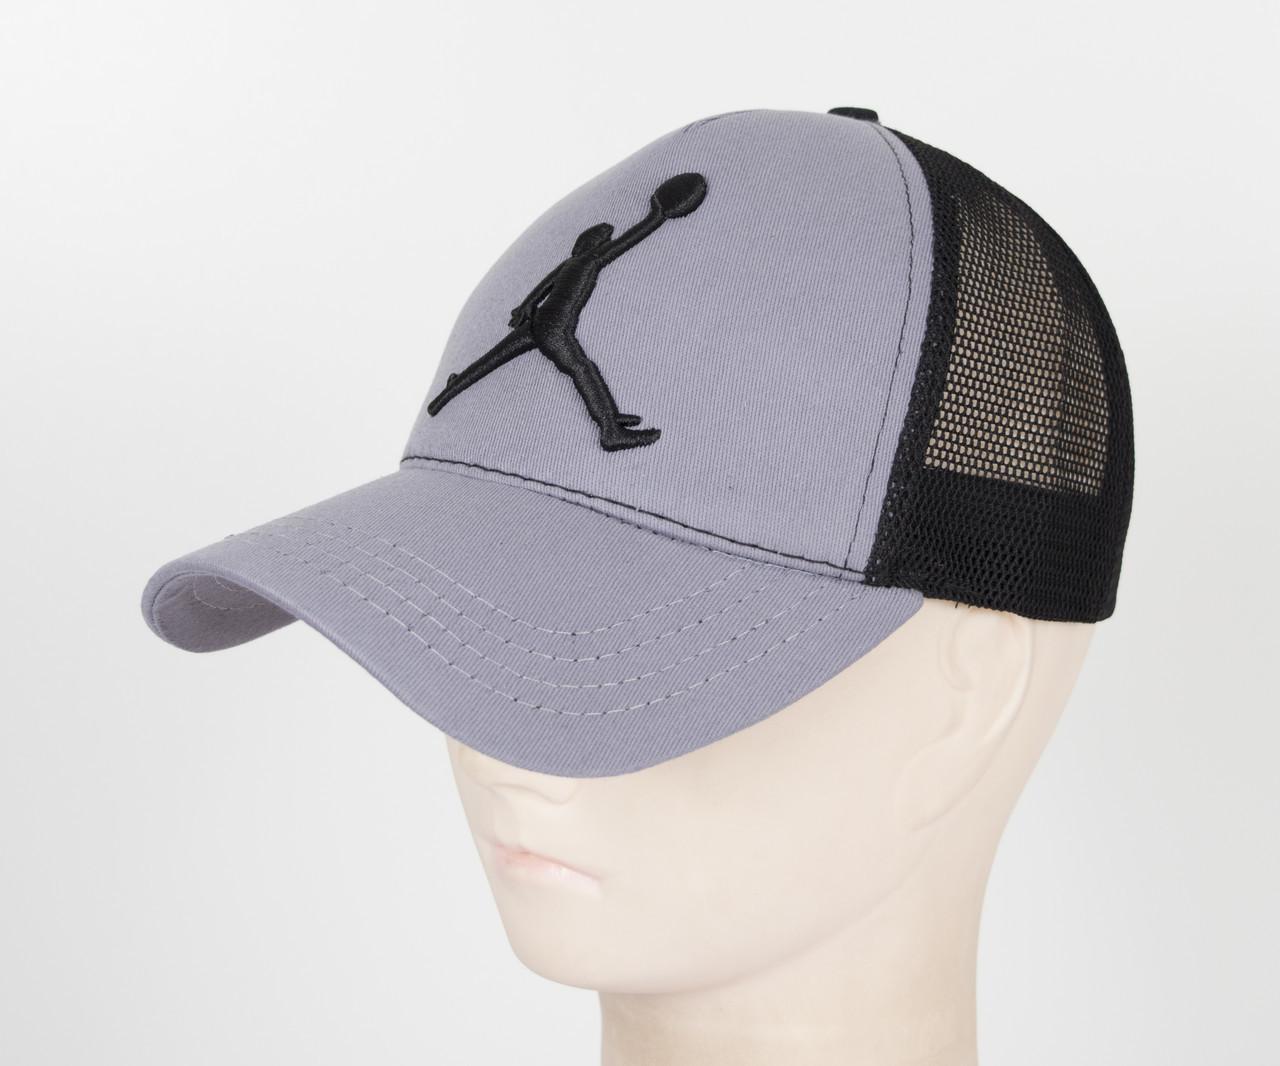 Бейсболка вышивка сетка J1901 Серый